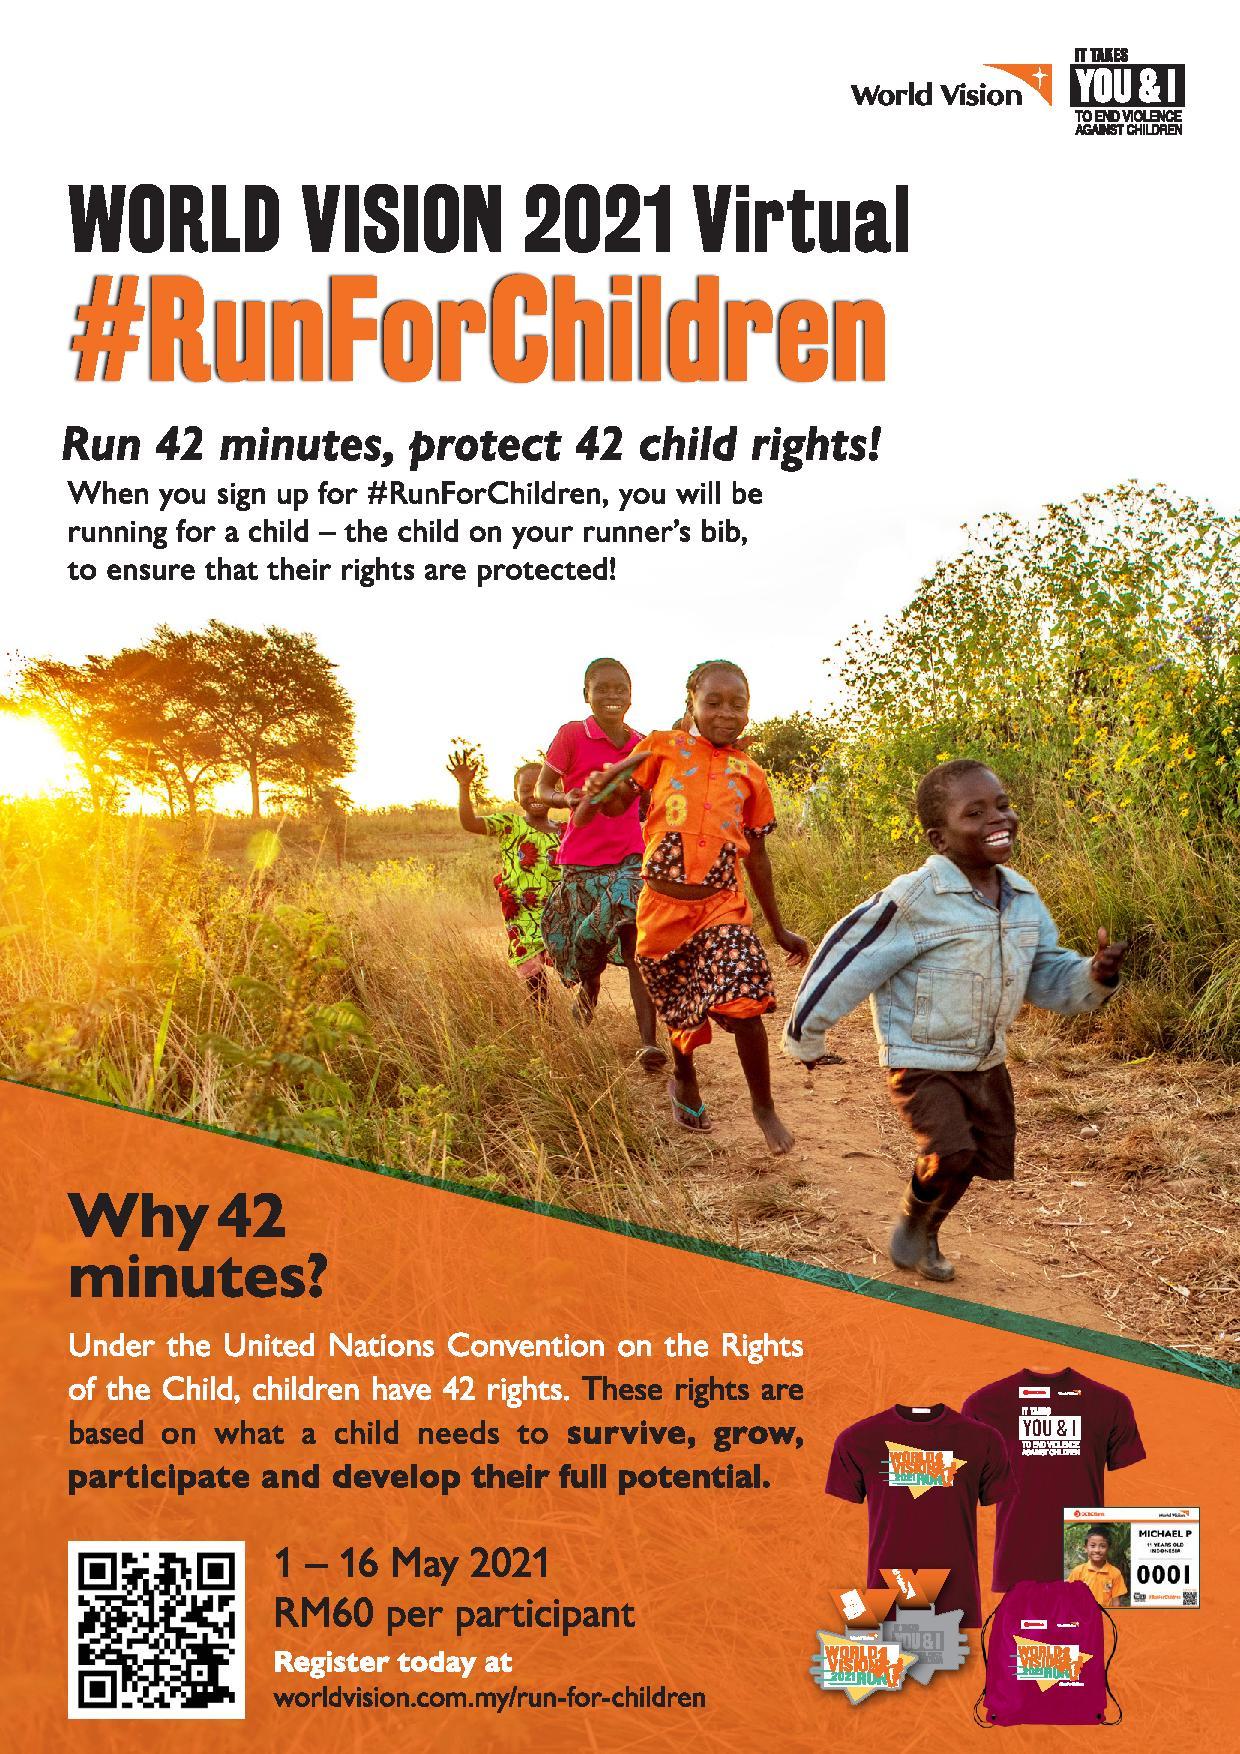 Logo of World Vision 2021 Virtual #RunForChildren